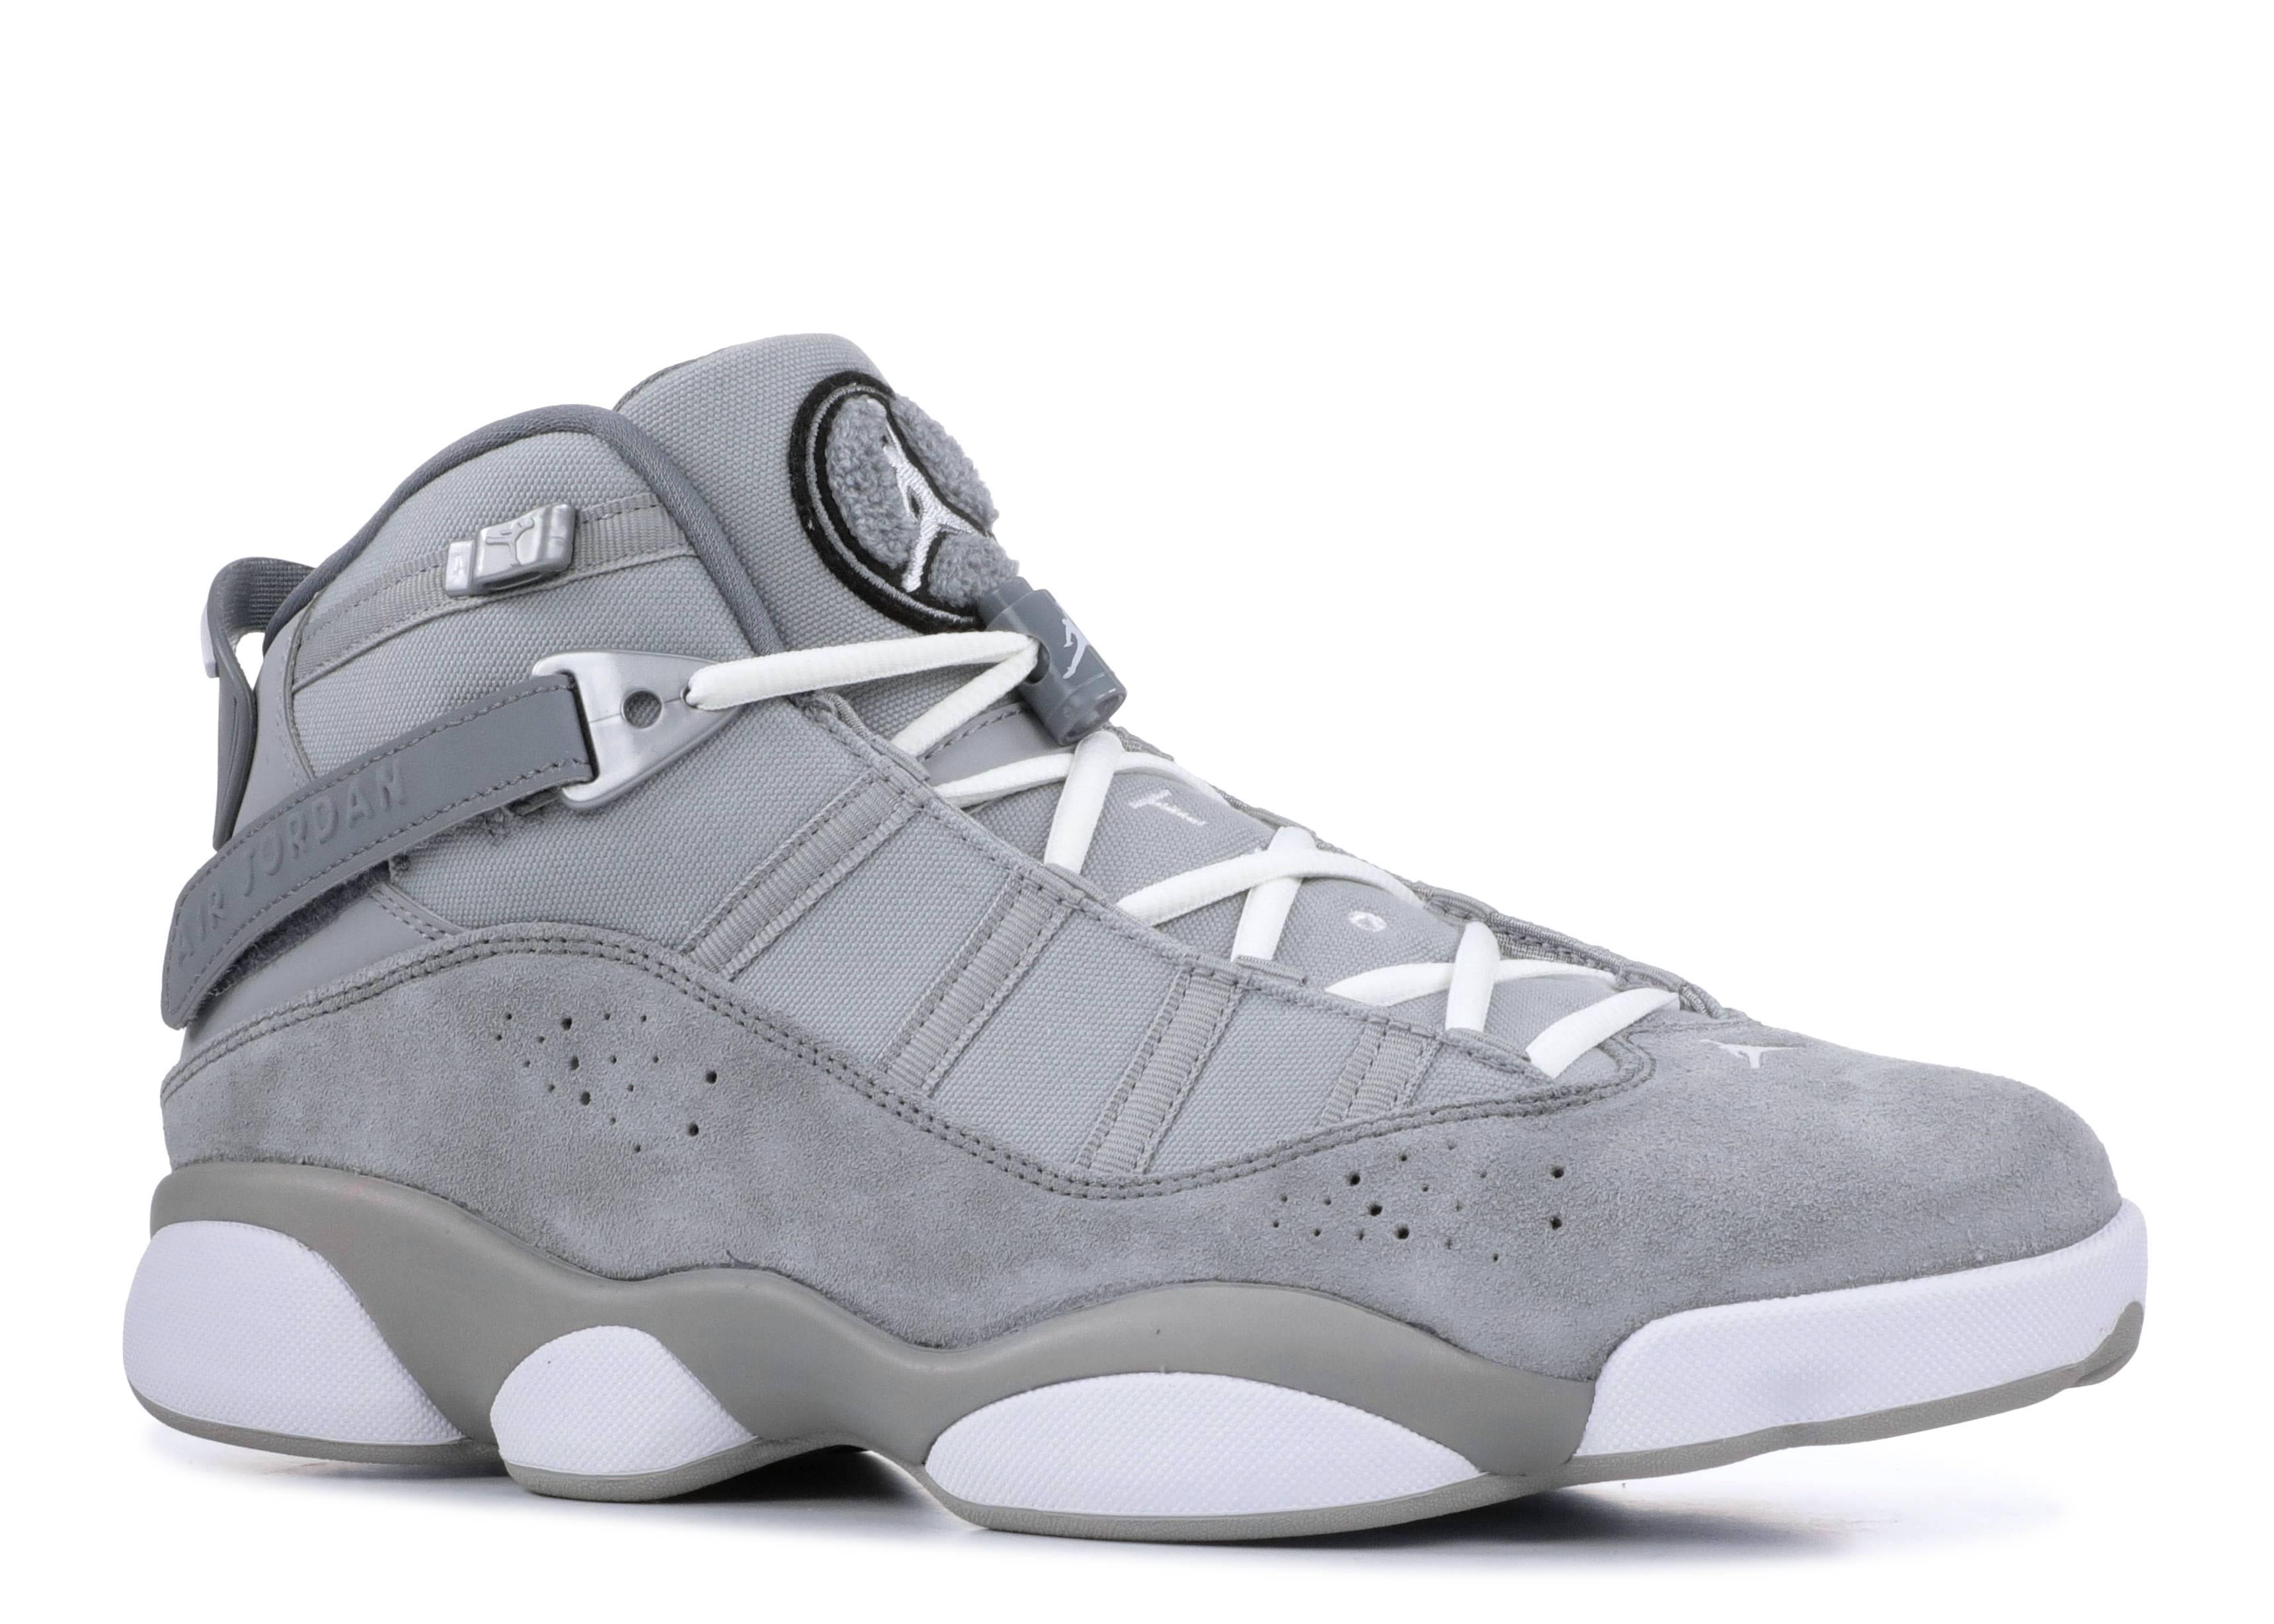 size 40 a38bf 2da2a Jordan 6 Rings